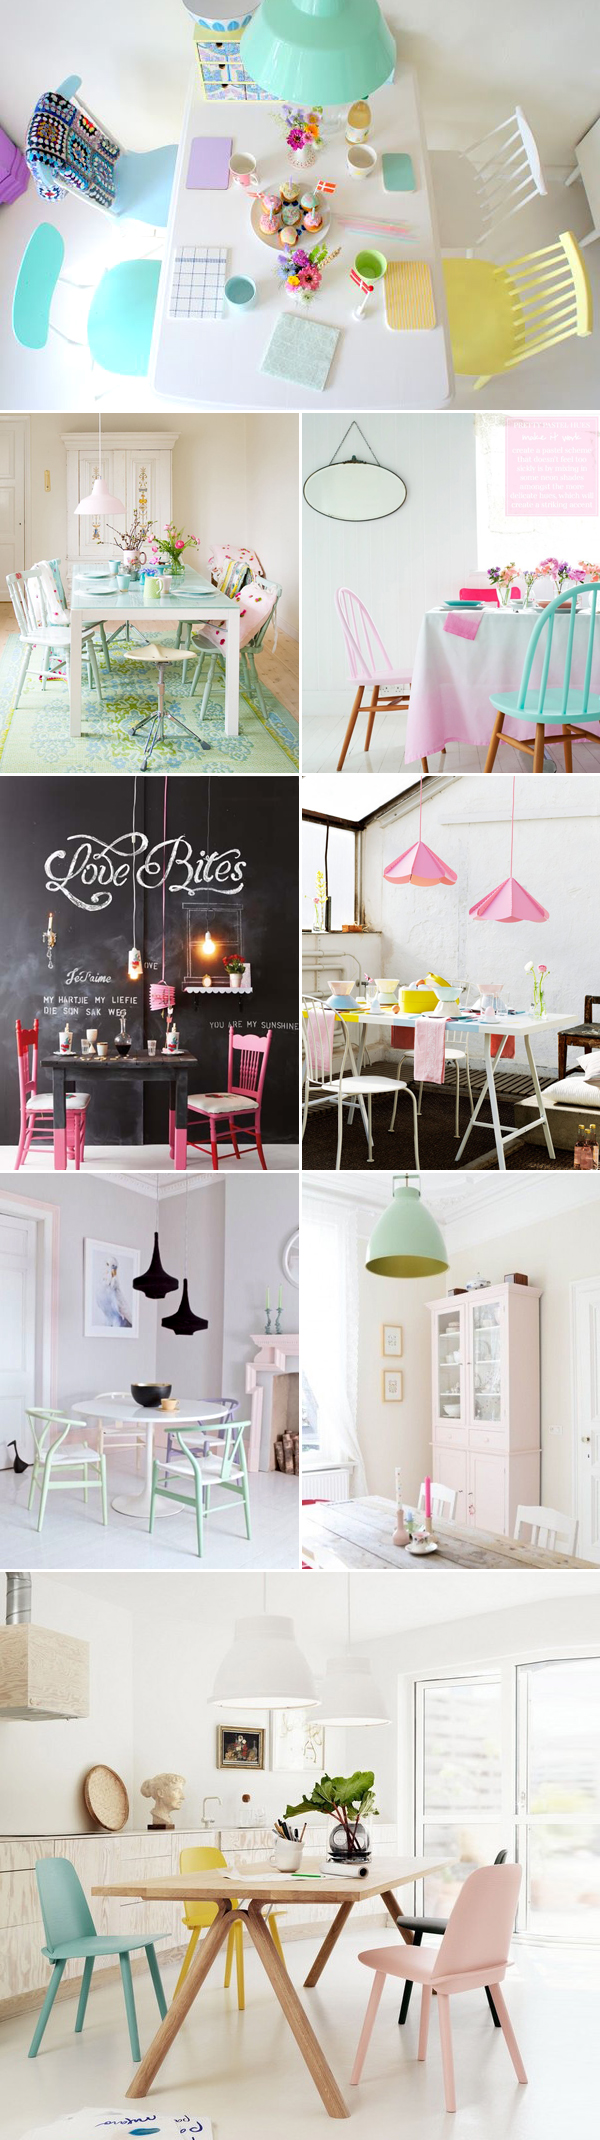 dinning-room2-pastel